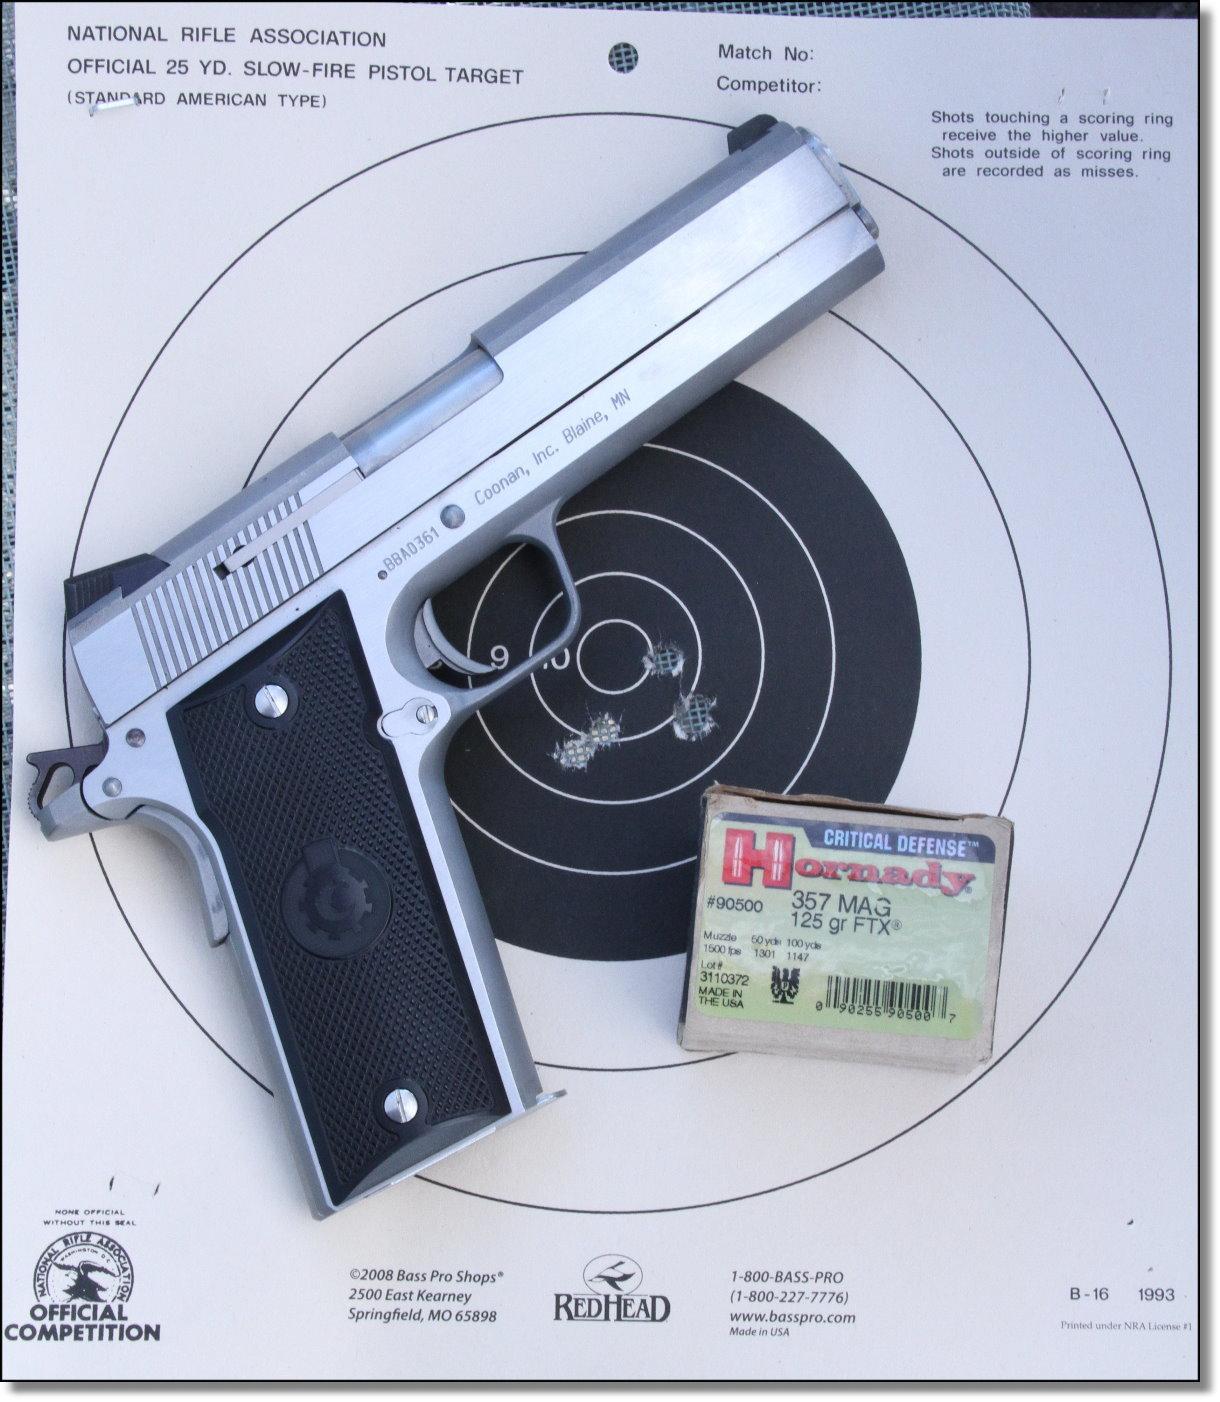 Coonan Arms Classic .357 Magnum 1911 Pistol - GunsAmerica Digest